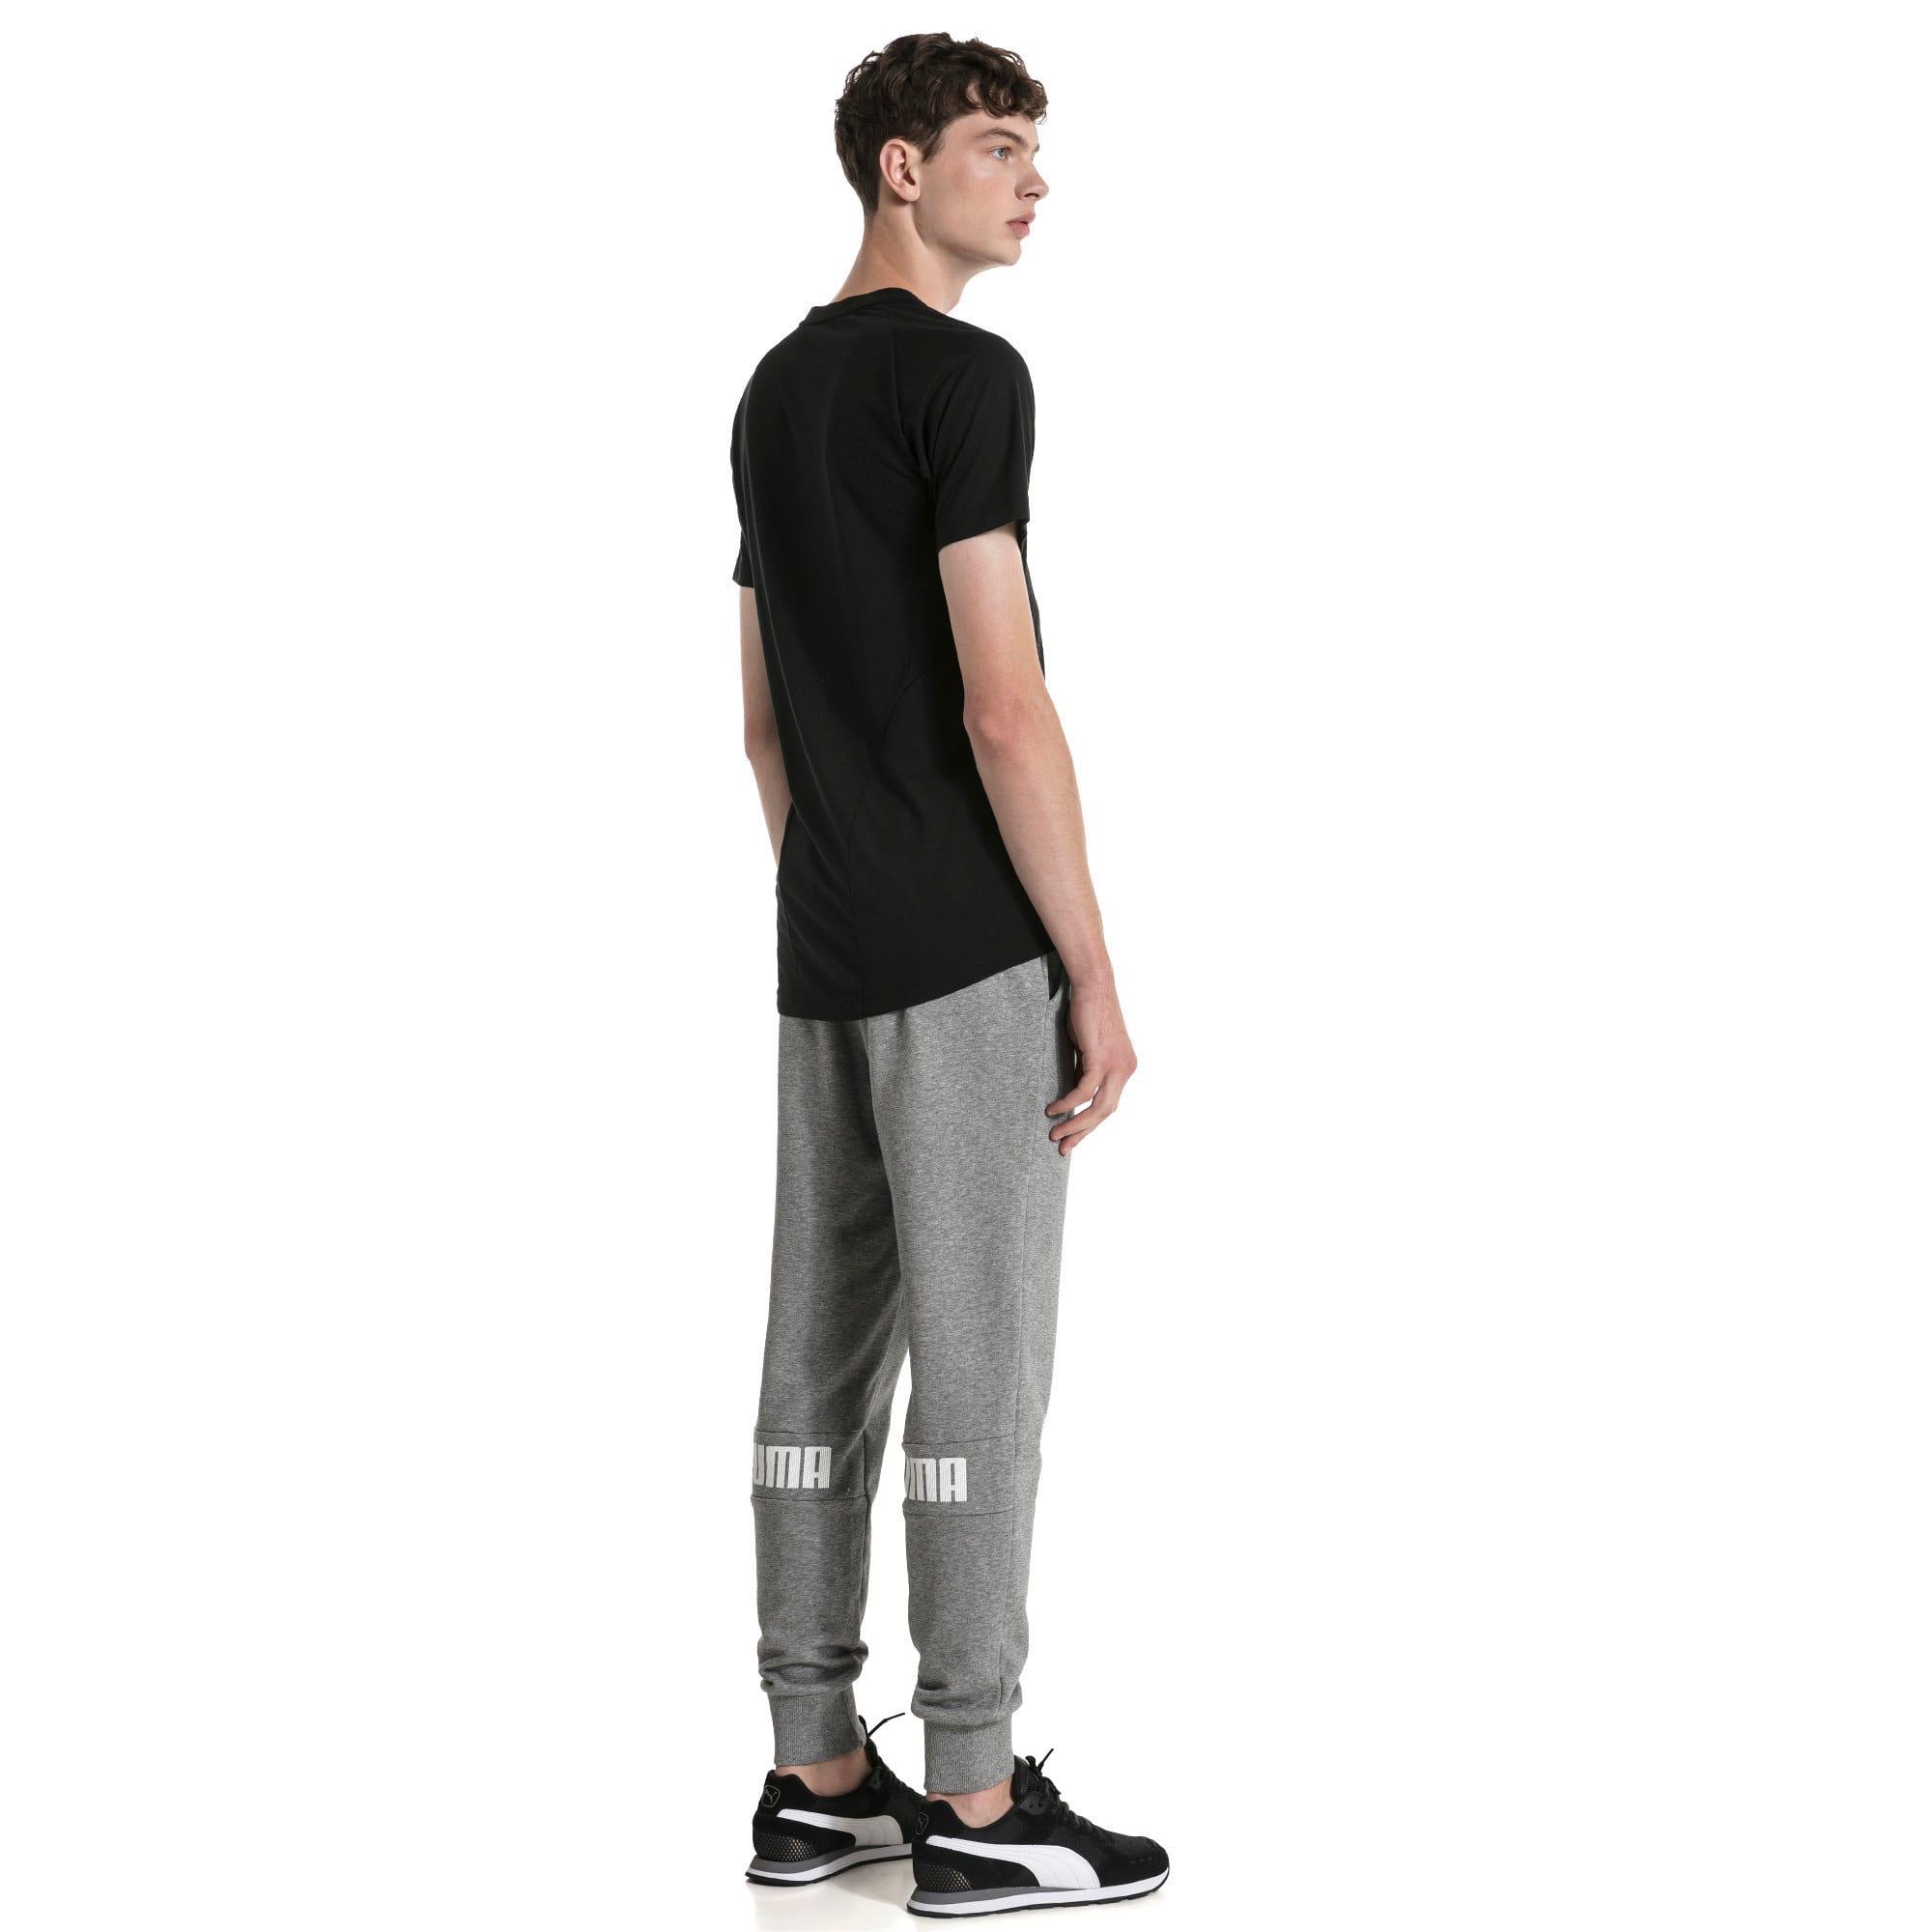 Thumbnail 3 of Amplified Men's Sweatpants, Medium Gray Heather, medium